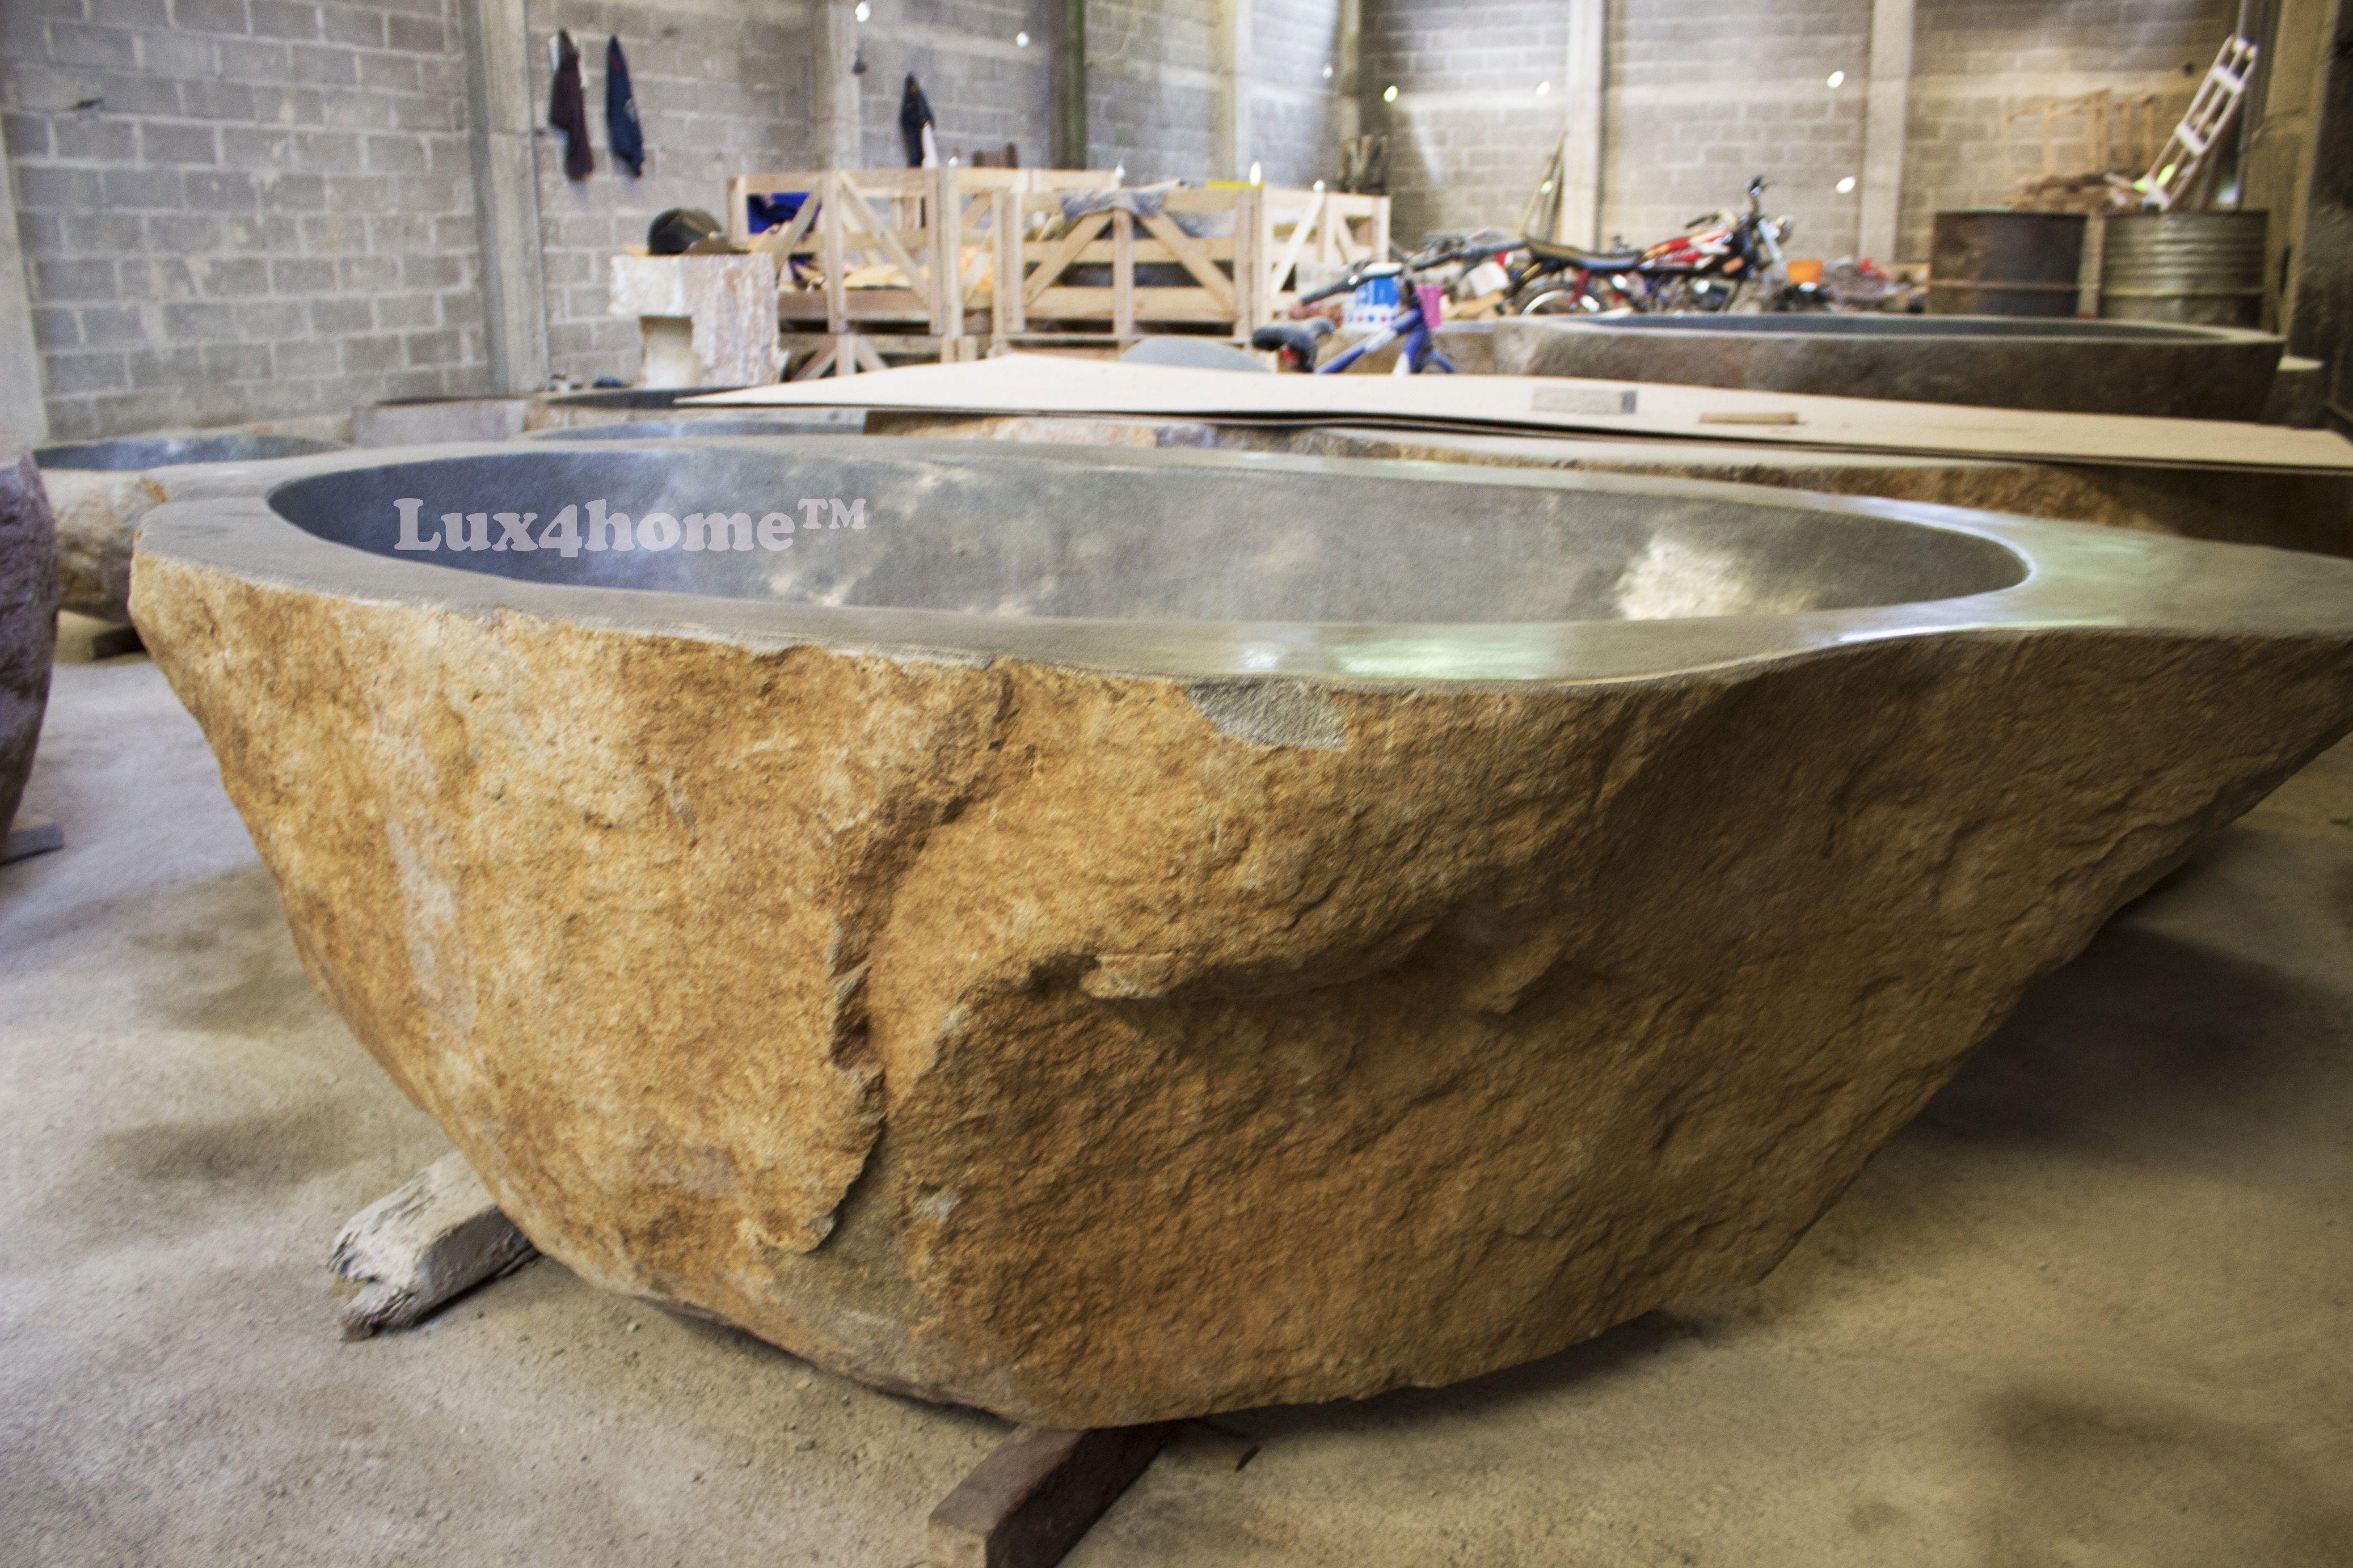 Indonesia Bali Stone #Bathtubs for sale. The price #stone #bathtub ...